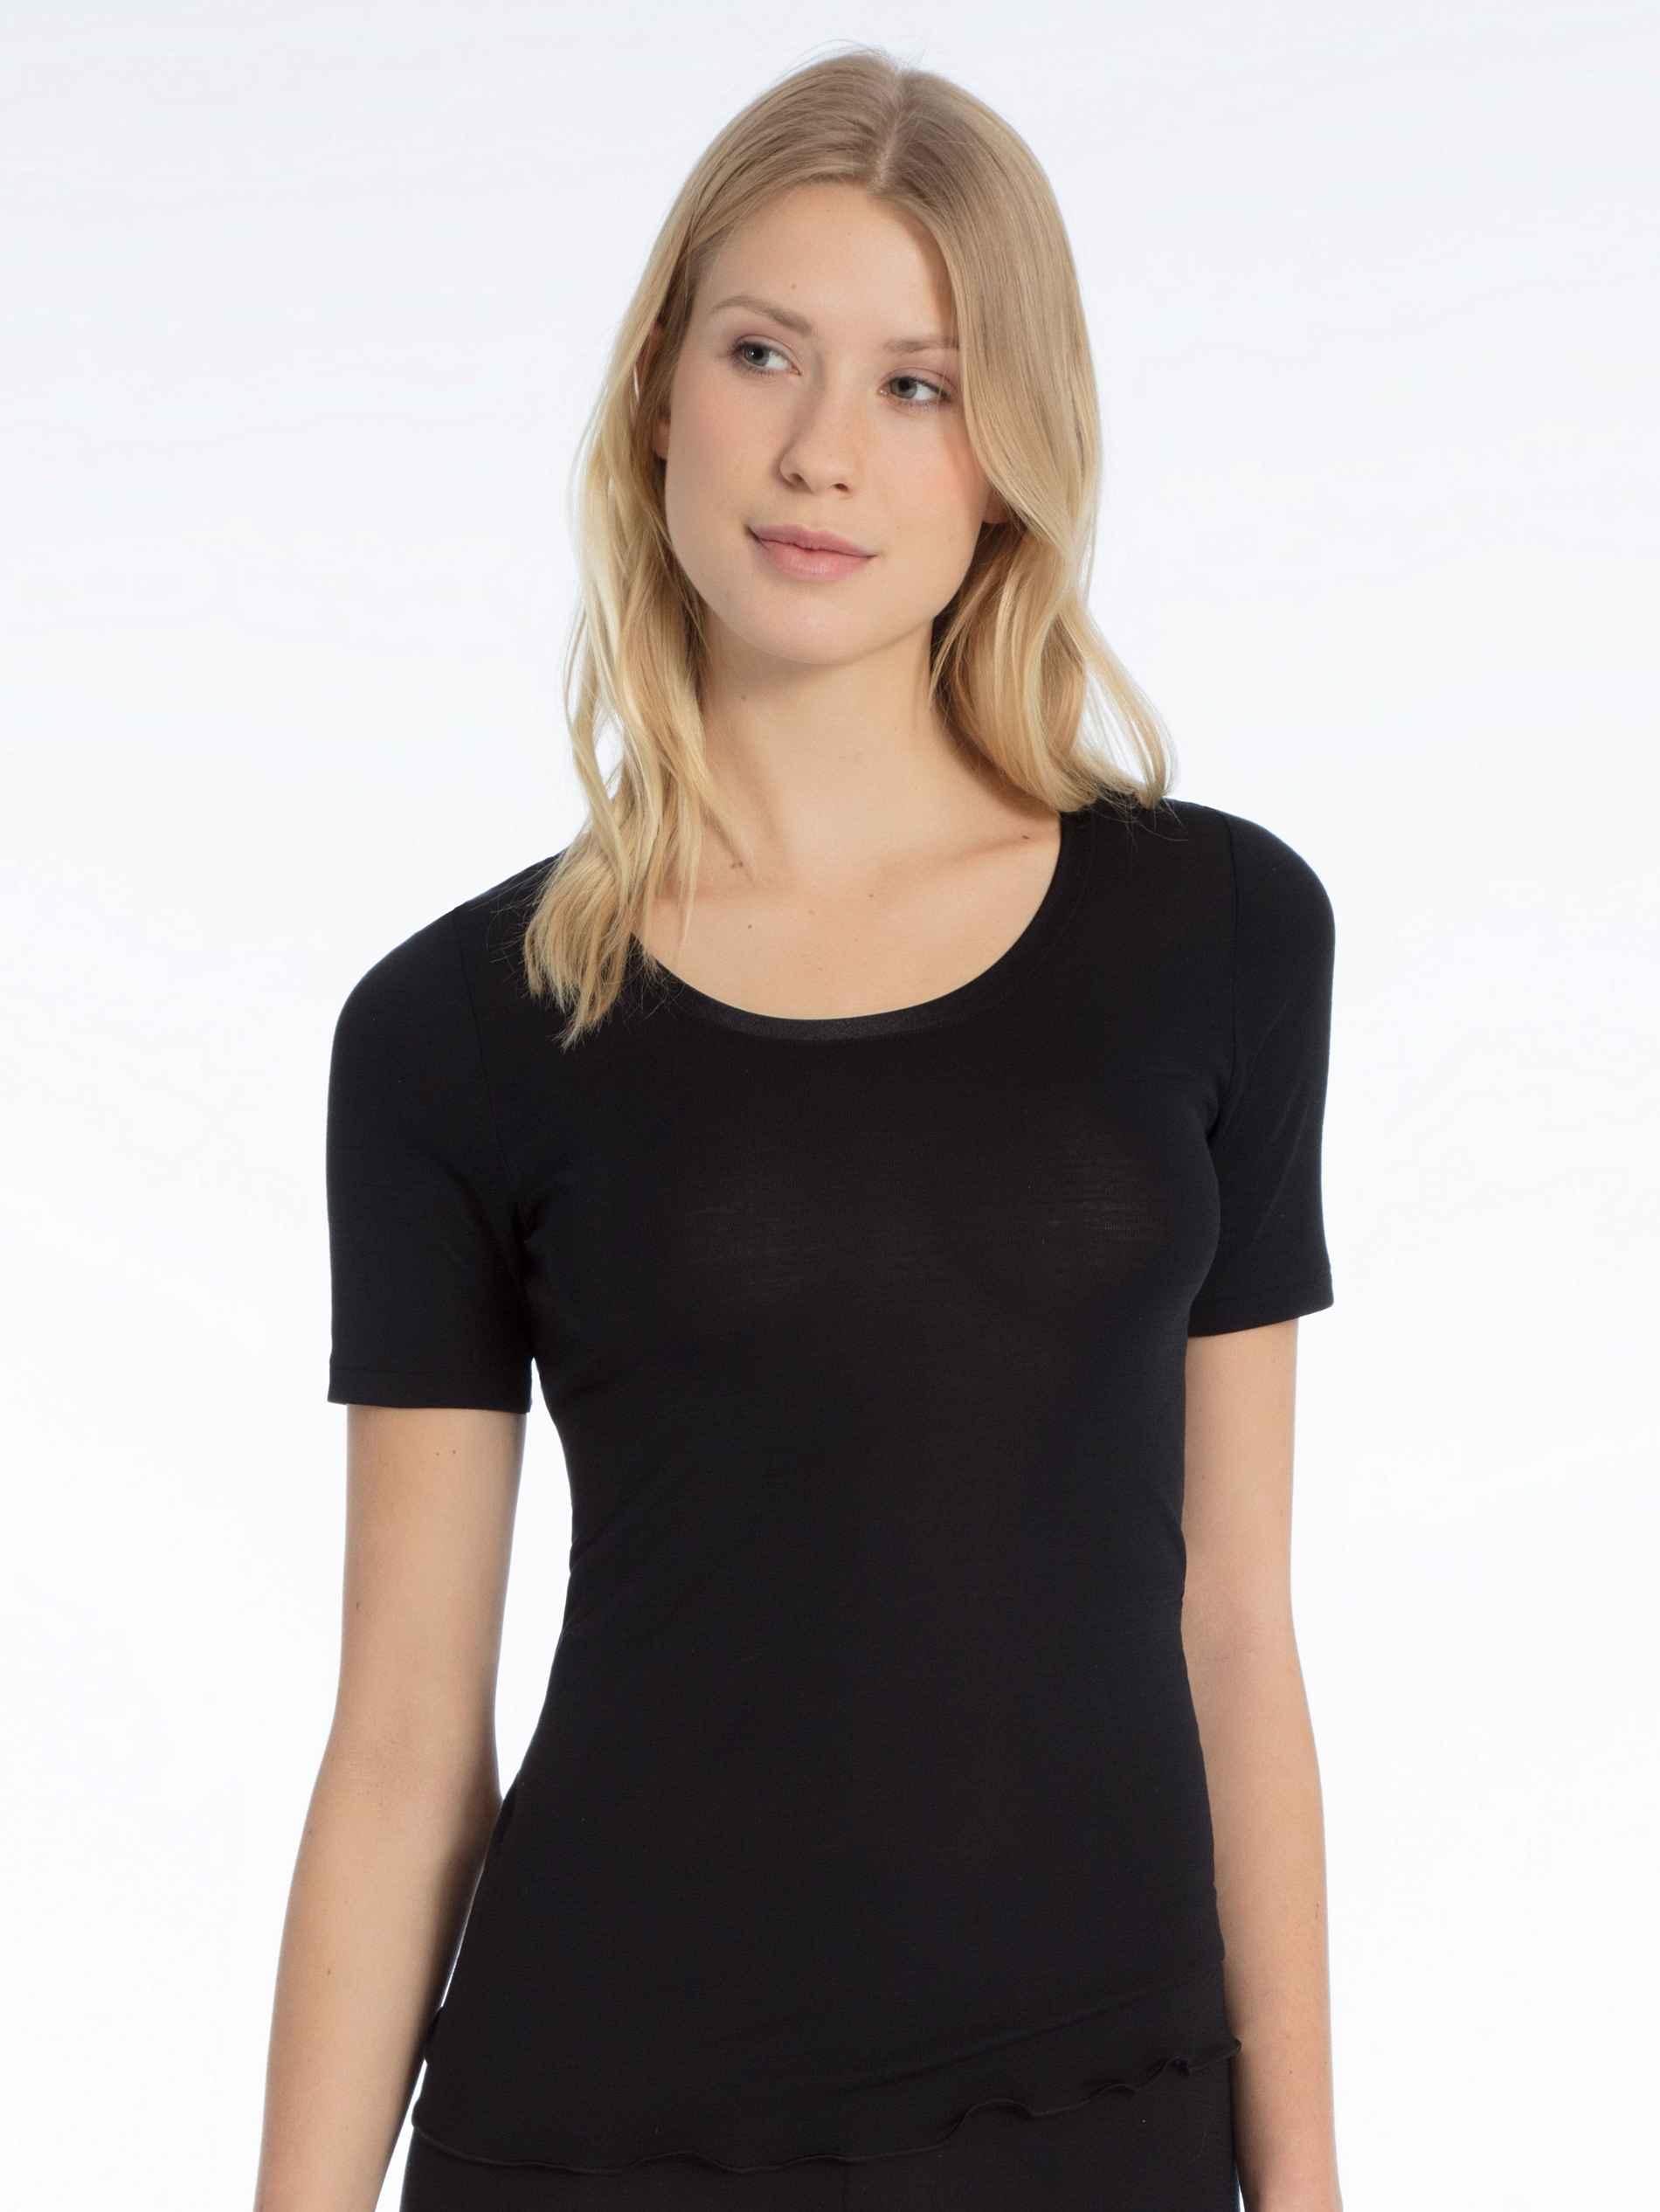 Damen CALIDA True Confidence Kurzarm-Shirt aus Wolle-Seide schwarz | 07613306584919